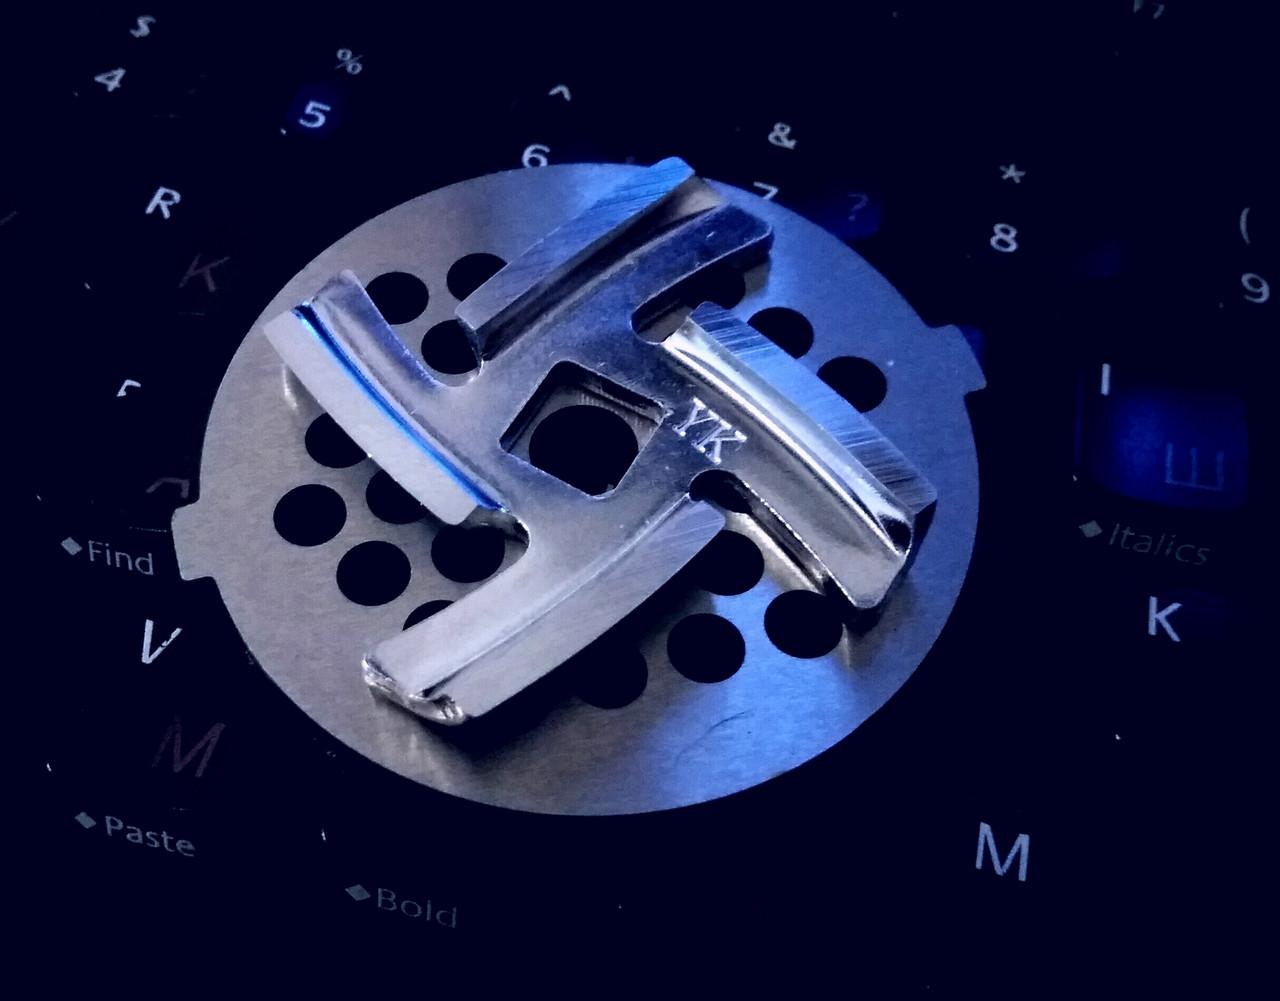 Комплект нож и решетка для мясорубки Сатурн (Saturn)